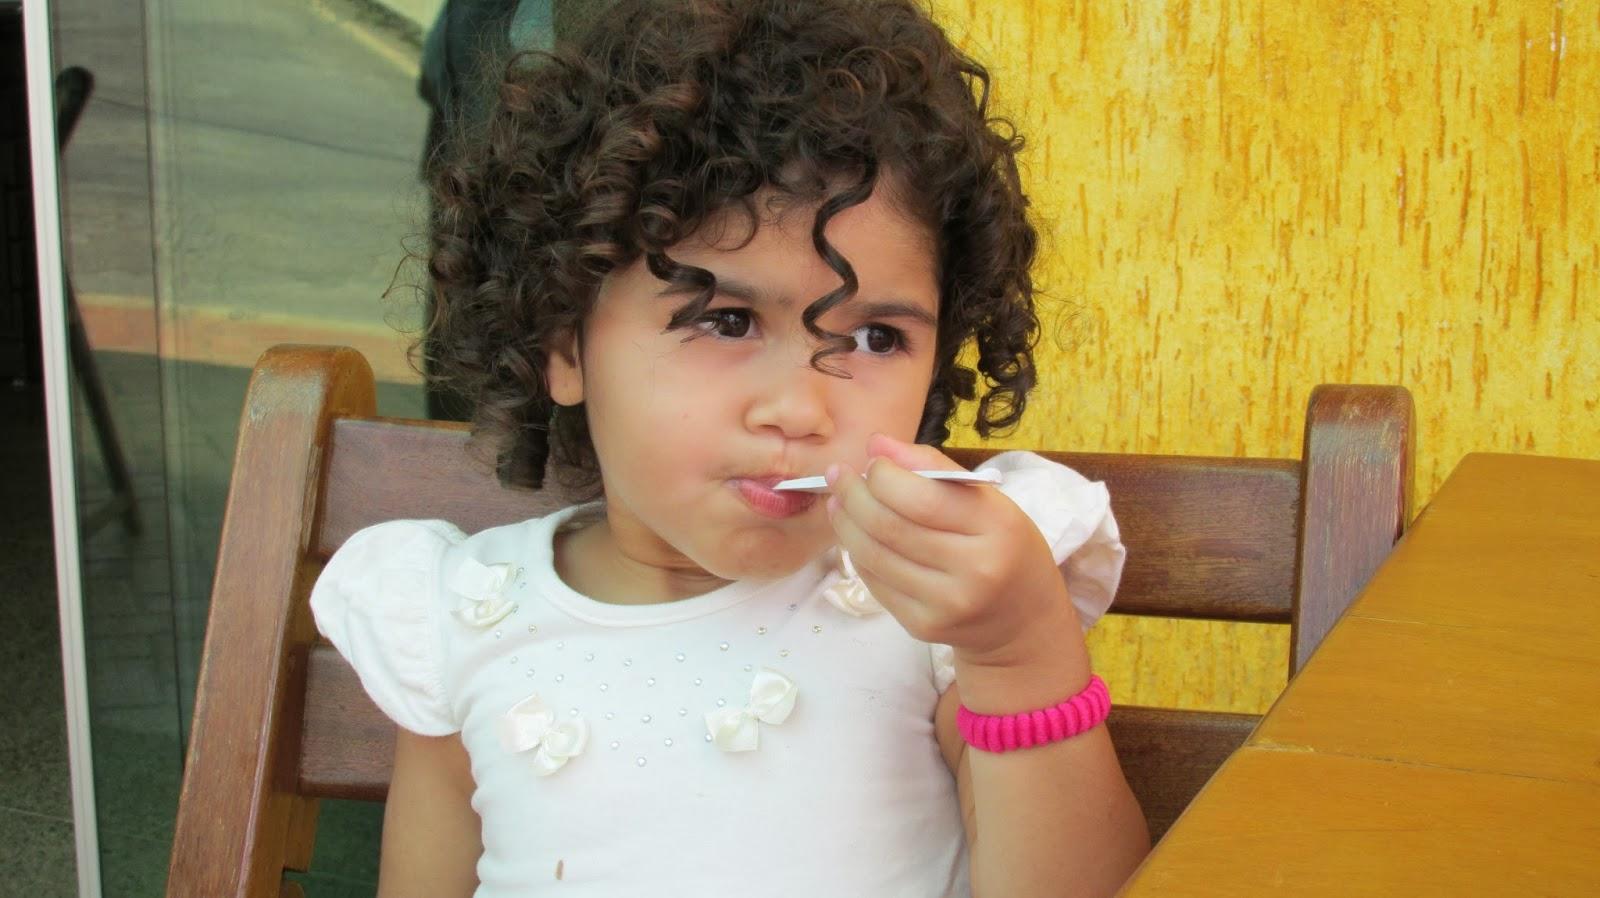 blog materno, maternidade, moda infantil, enxoval  de bebe, minifashionista,moda gestante, filhos, kids